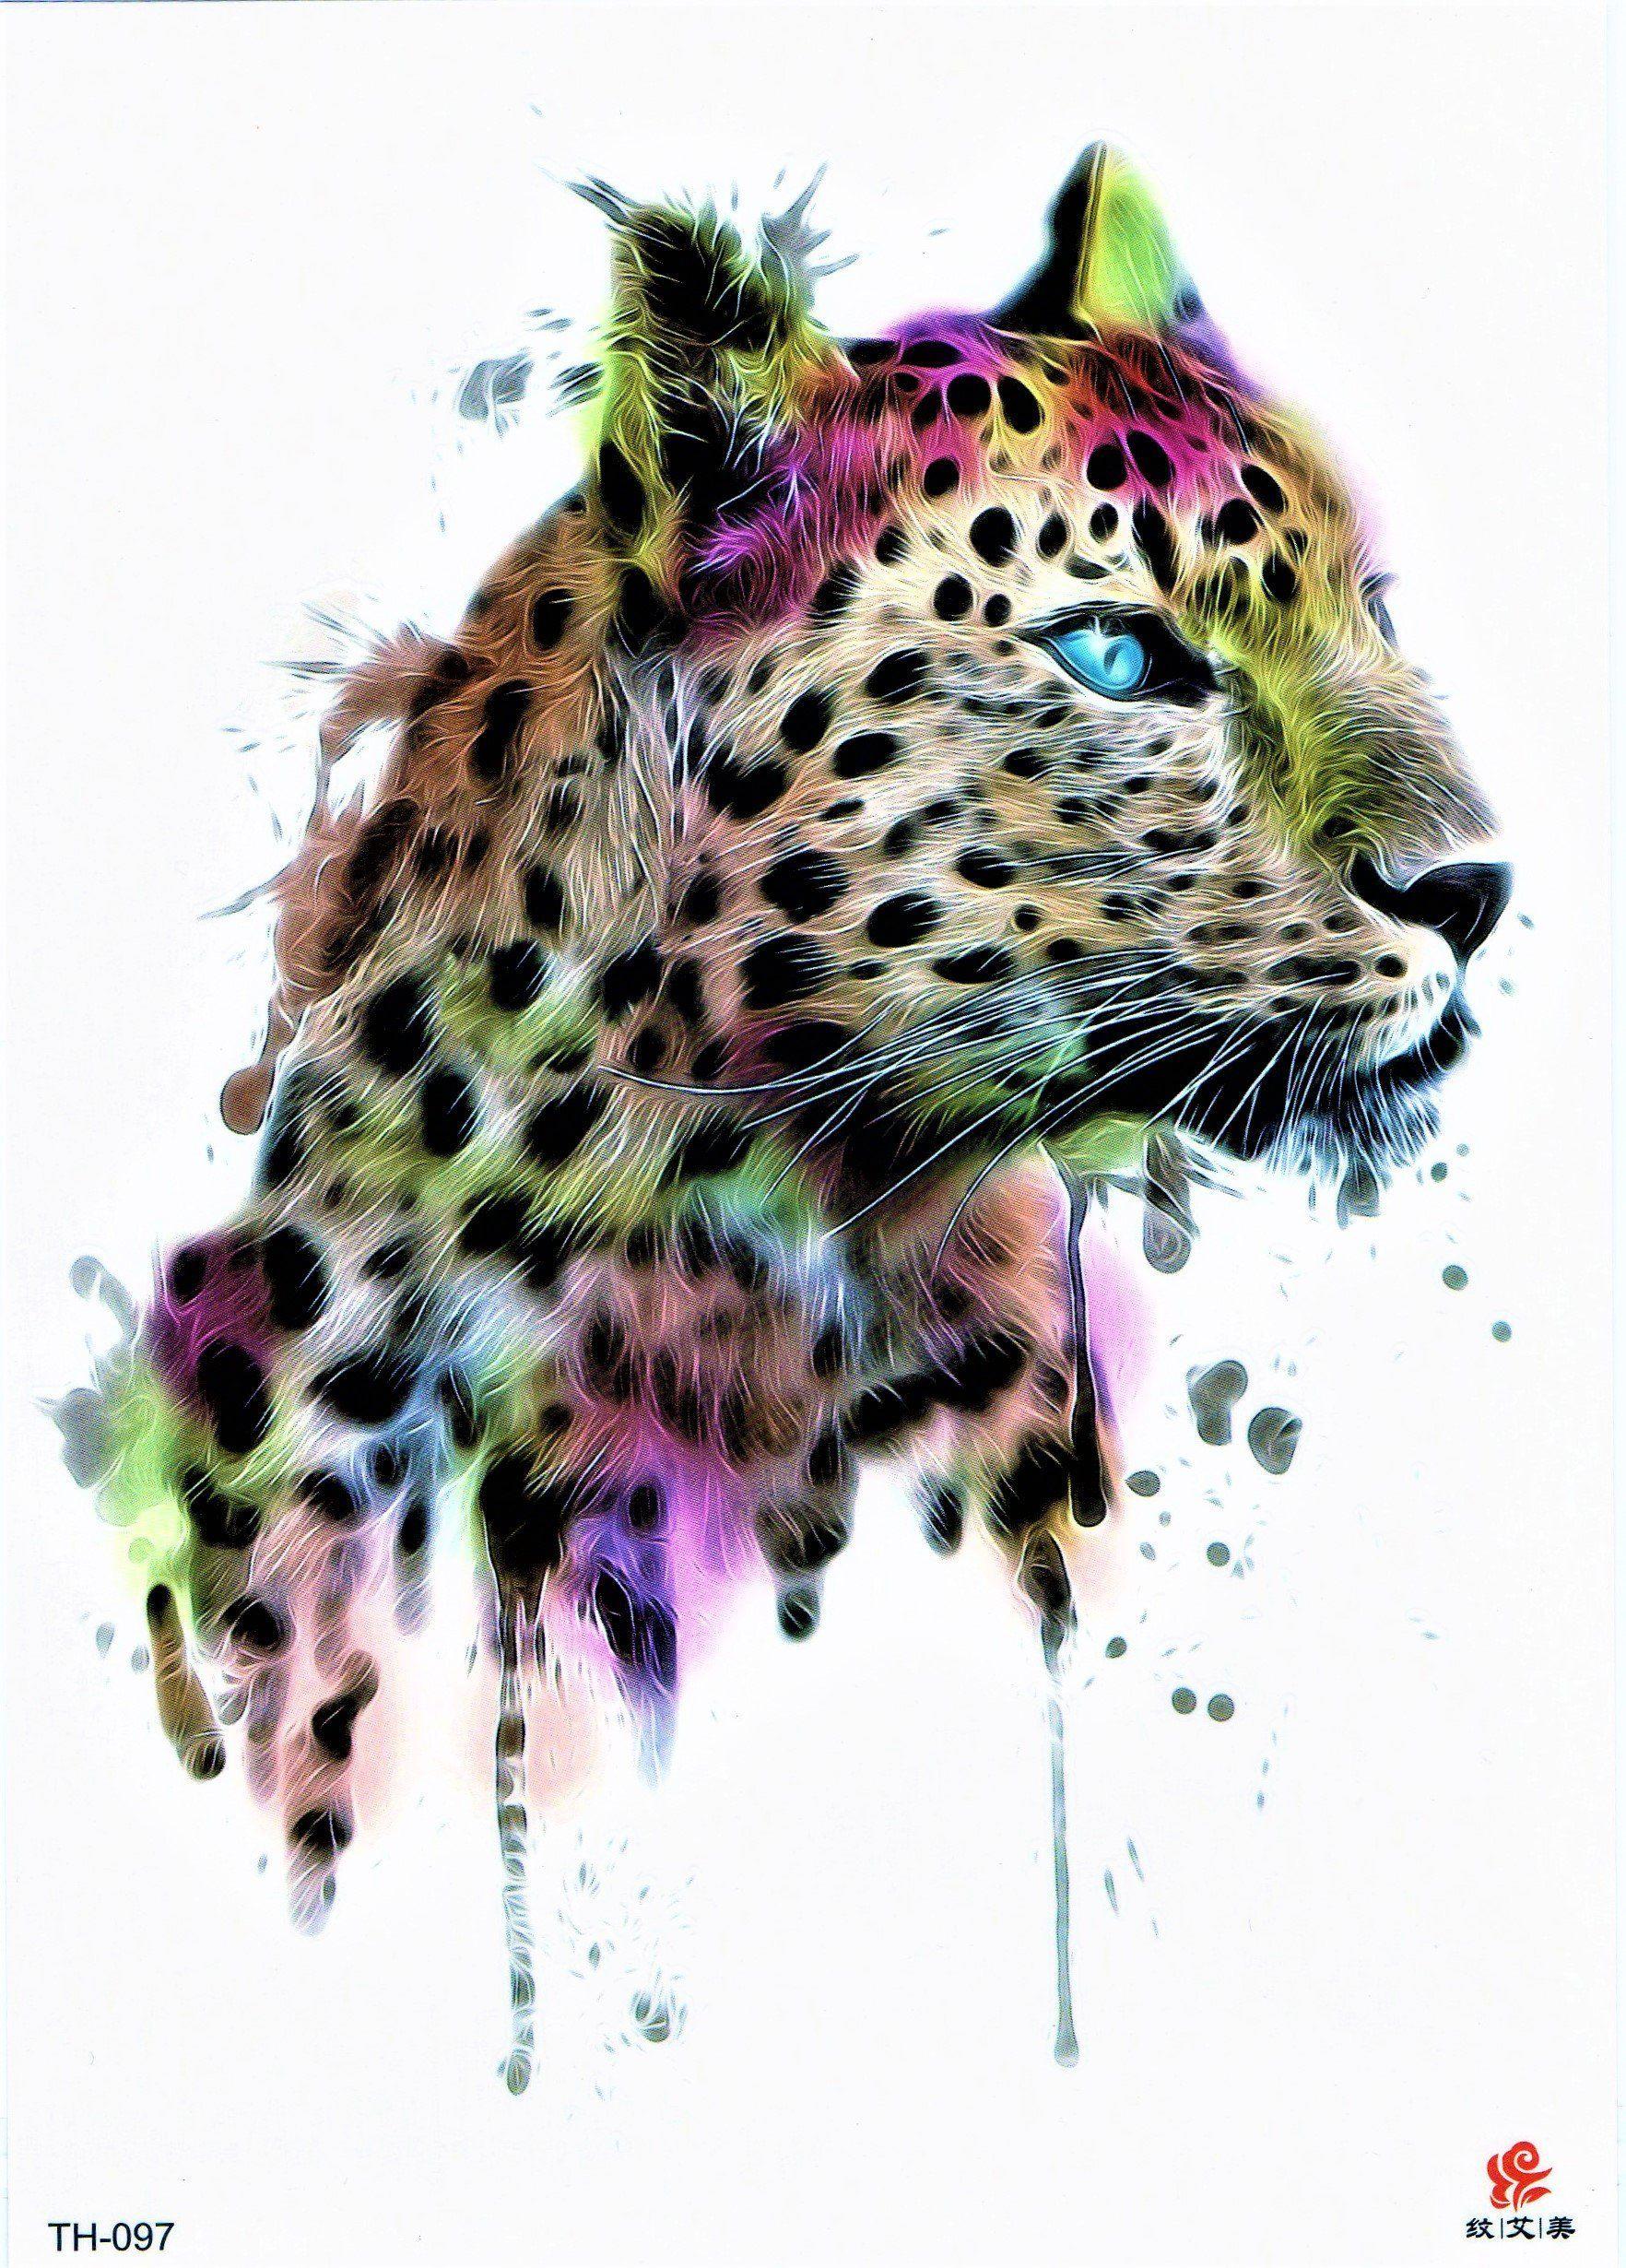 Tiger Jaguar Tier Bunt Wild Blut Aquarell Malerei Temporary